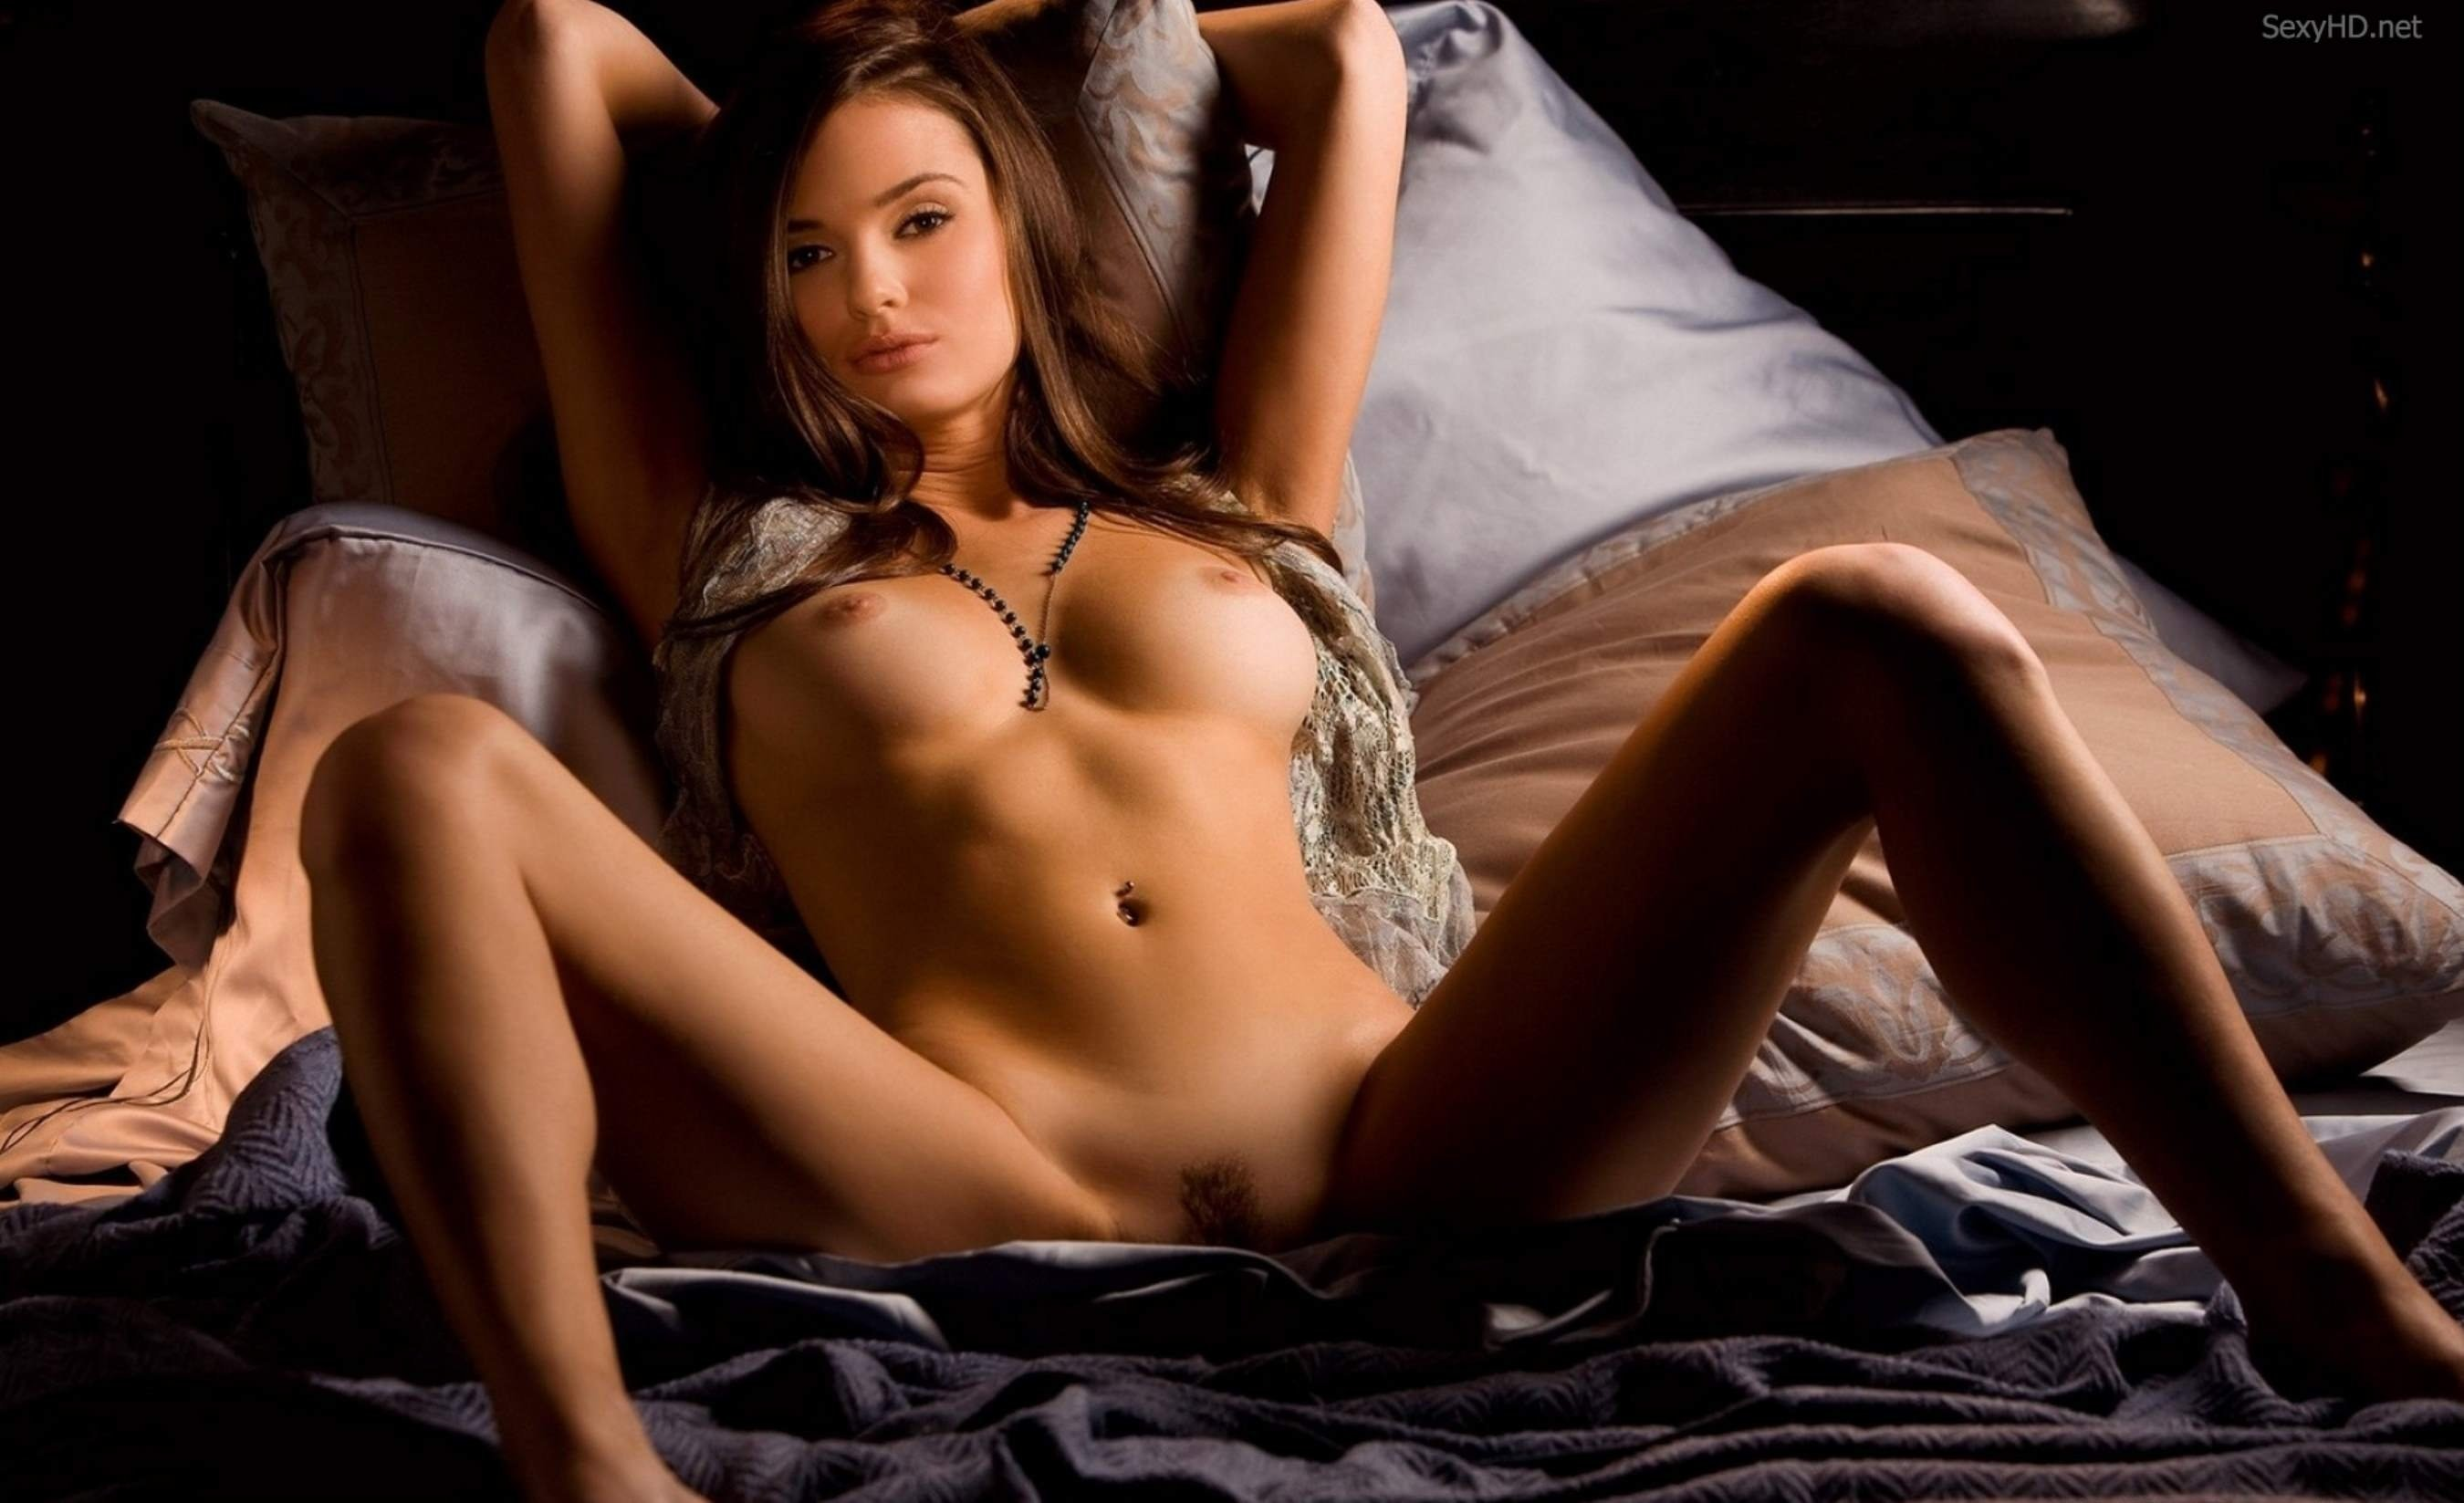 Erotika hd sex videa